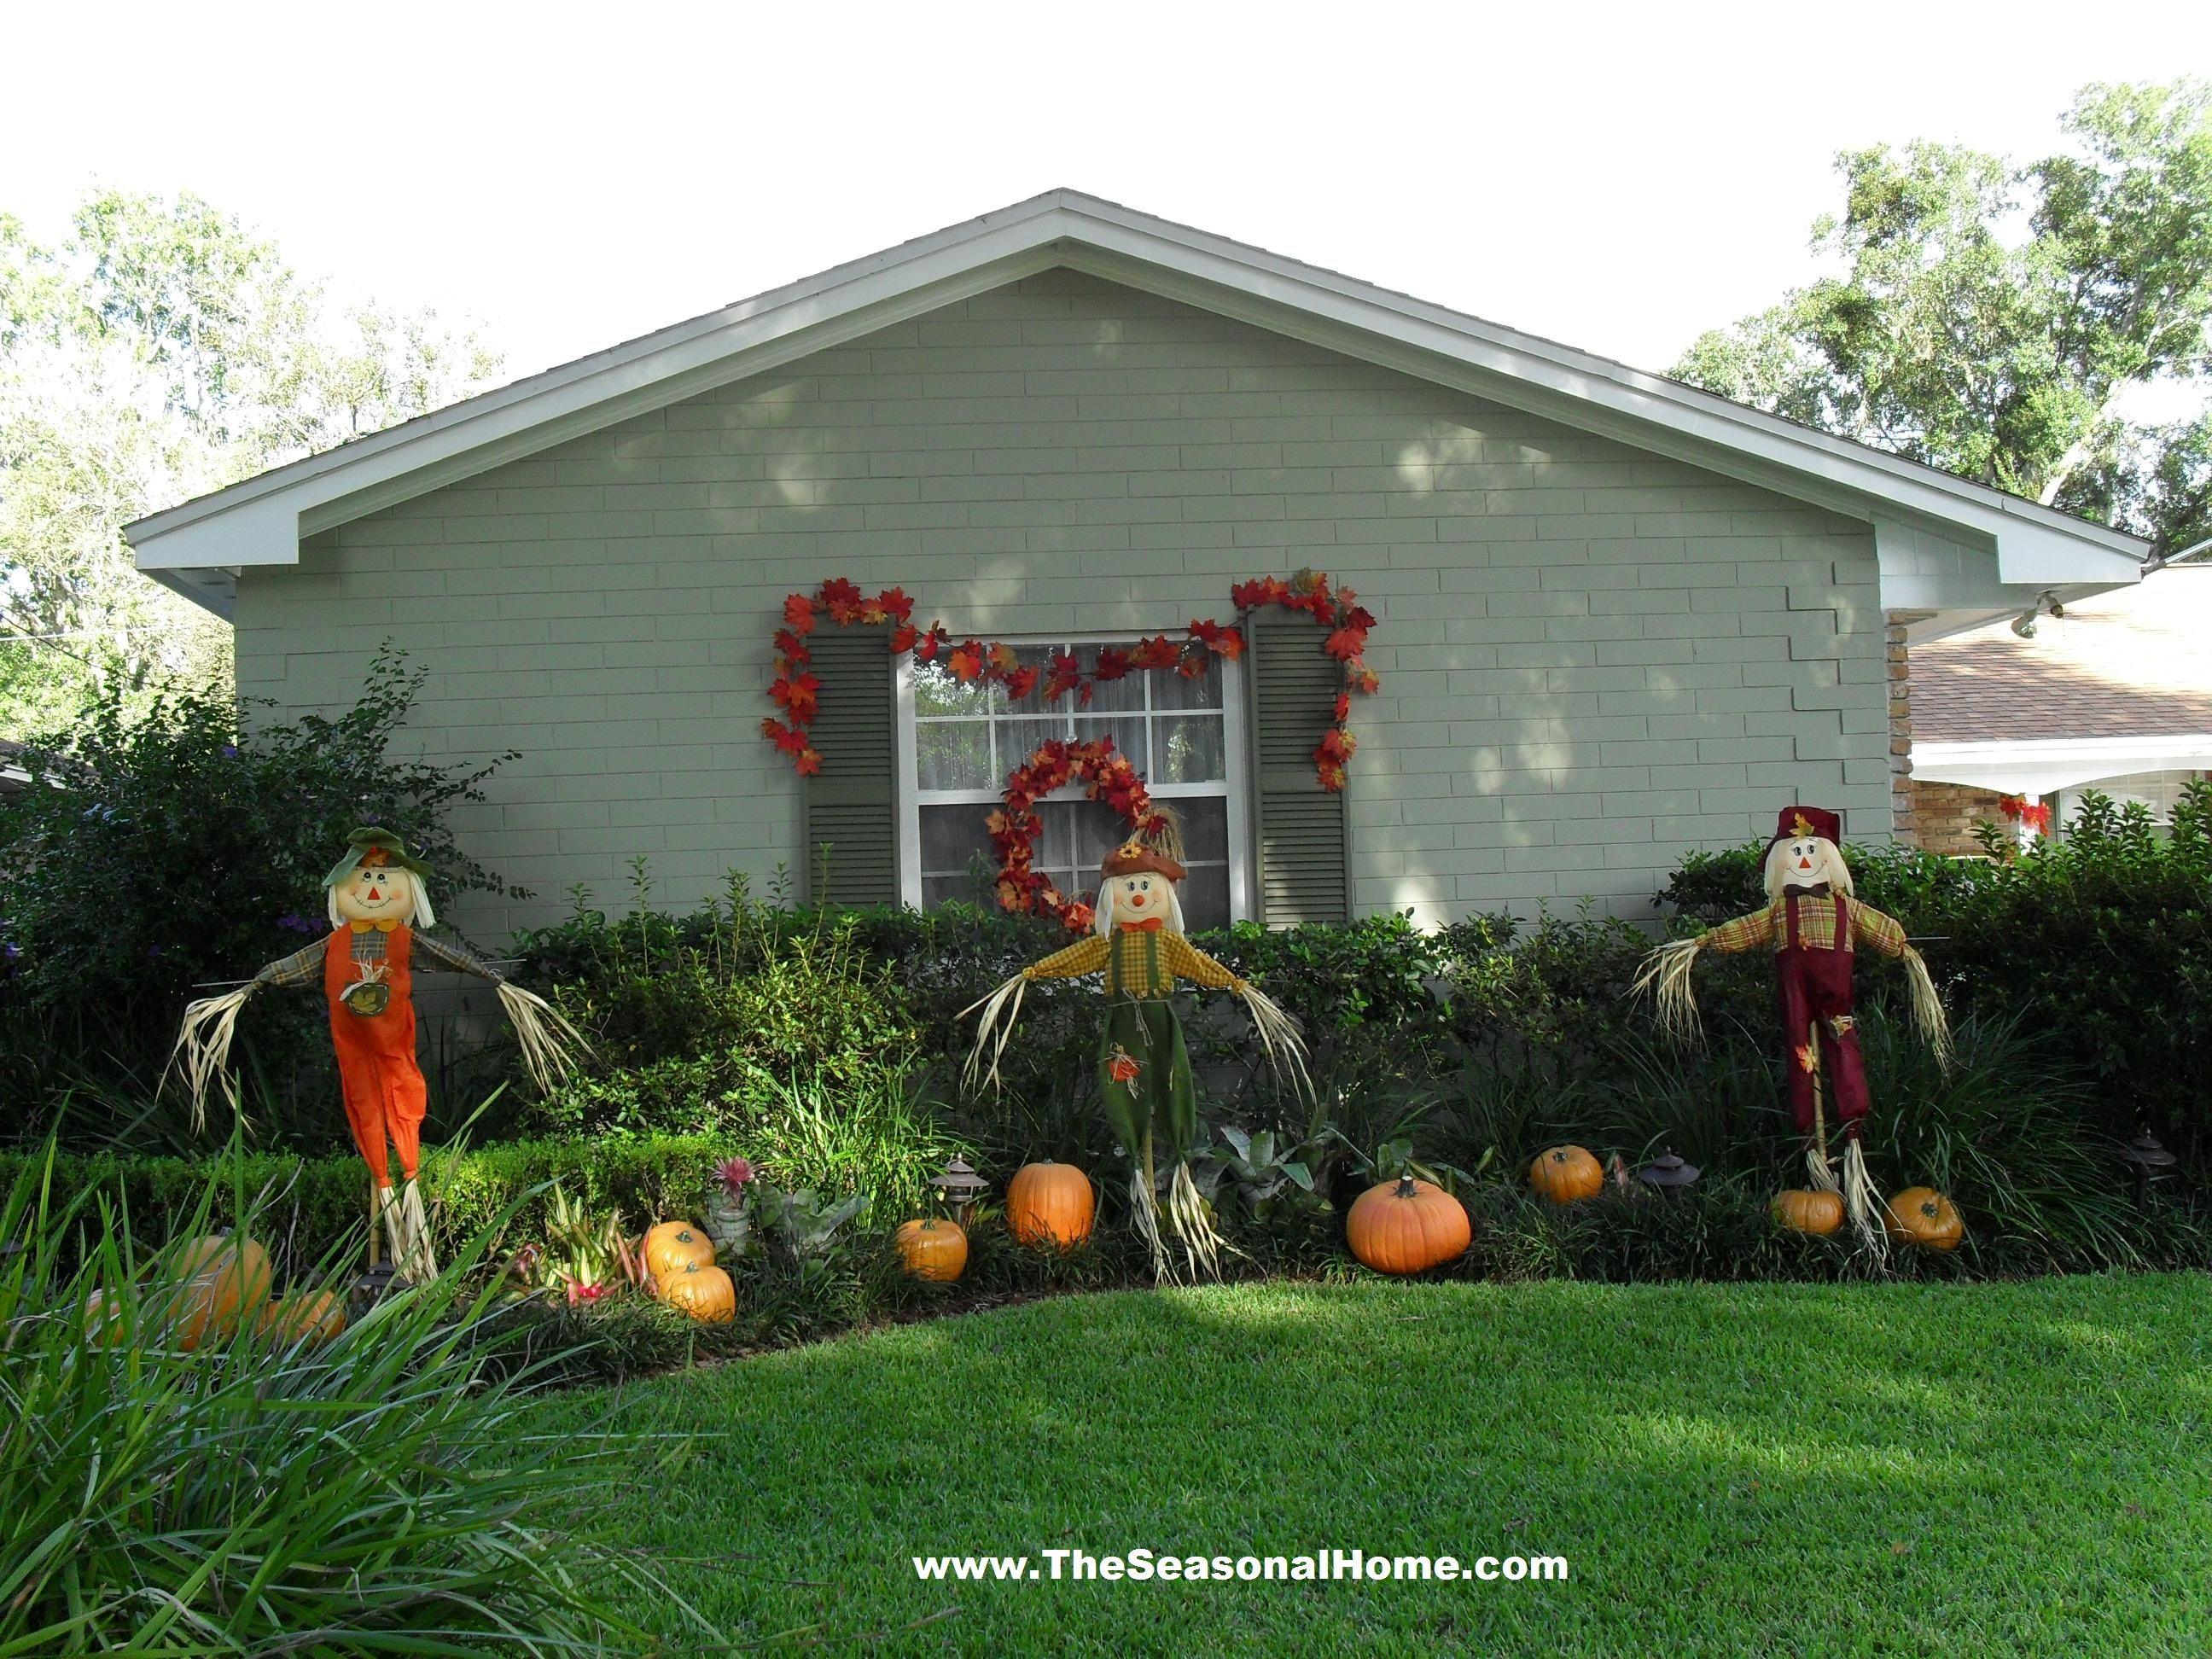 FALL YARD DECORATION IDEAS  The Seasonal Home